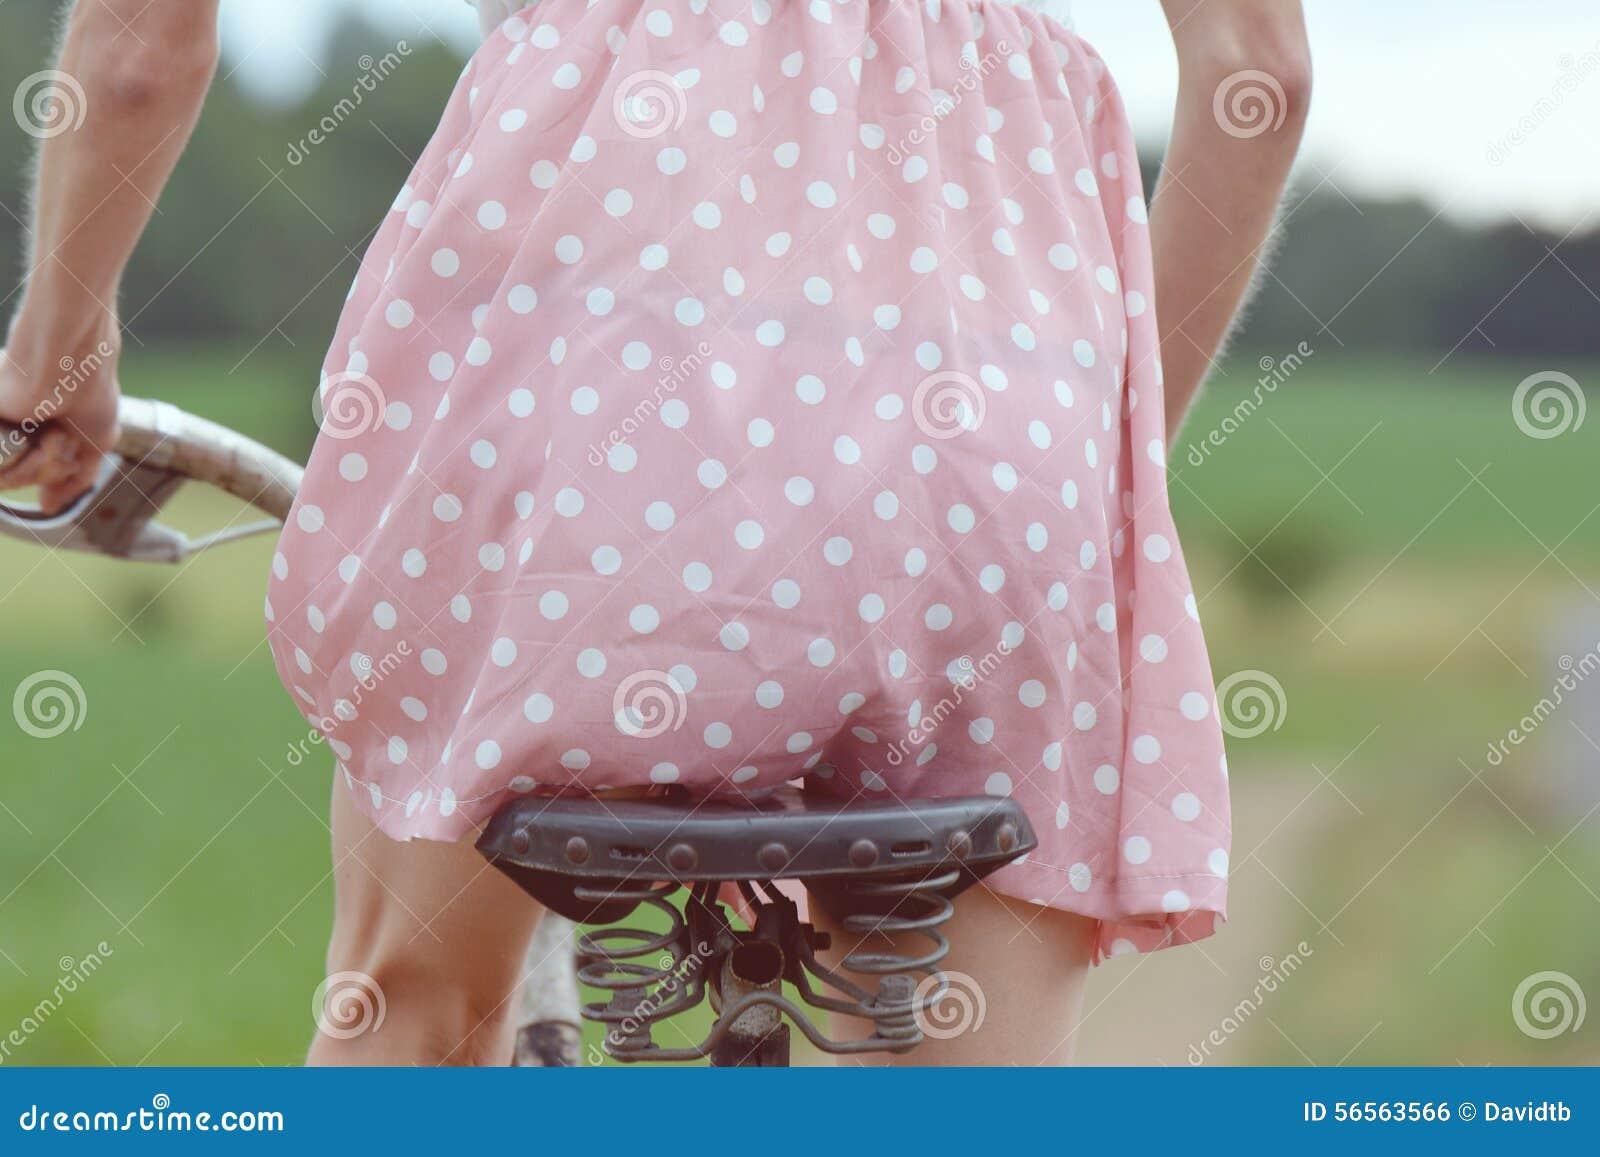 Download Μοντέρνο ντυμένο κορίτσι σε ένα παλαιό ποδήλατο με μια αναδρομική επίδραση Στοκ Εικόνες - εικόνα από μοντέρνος, κύκλος: 56563566